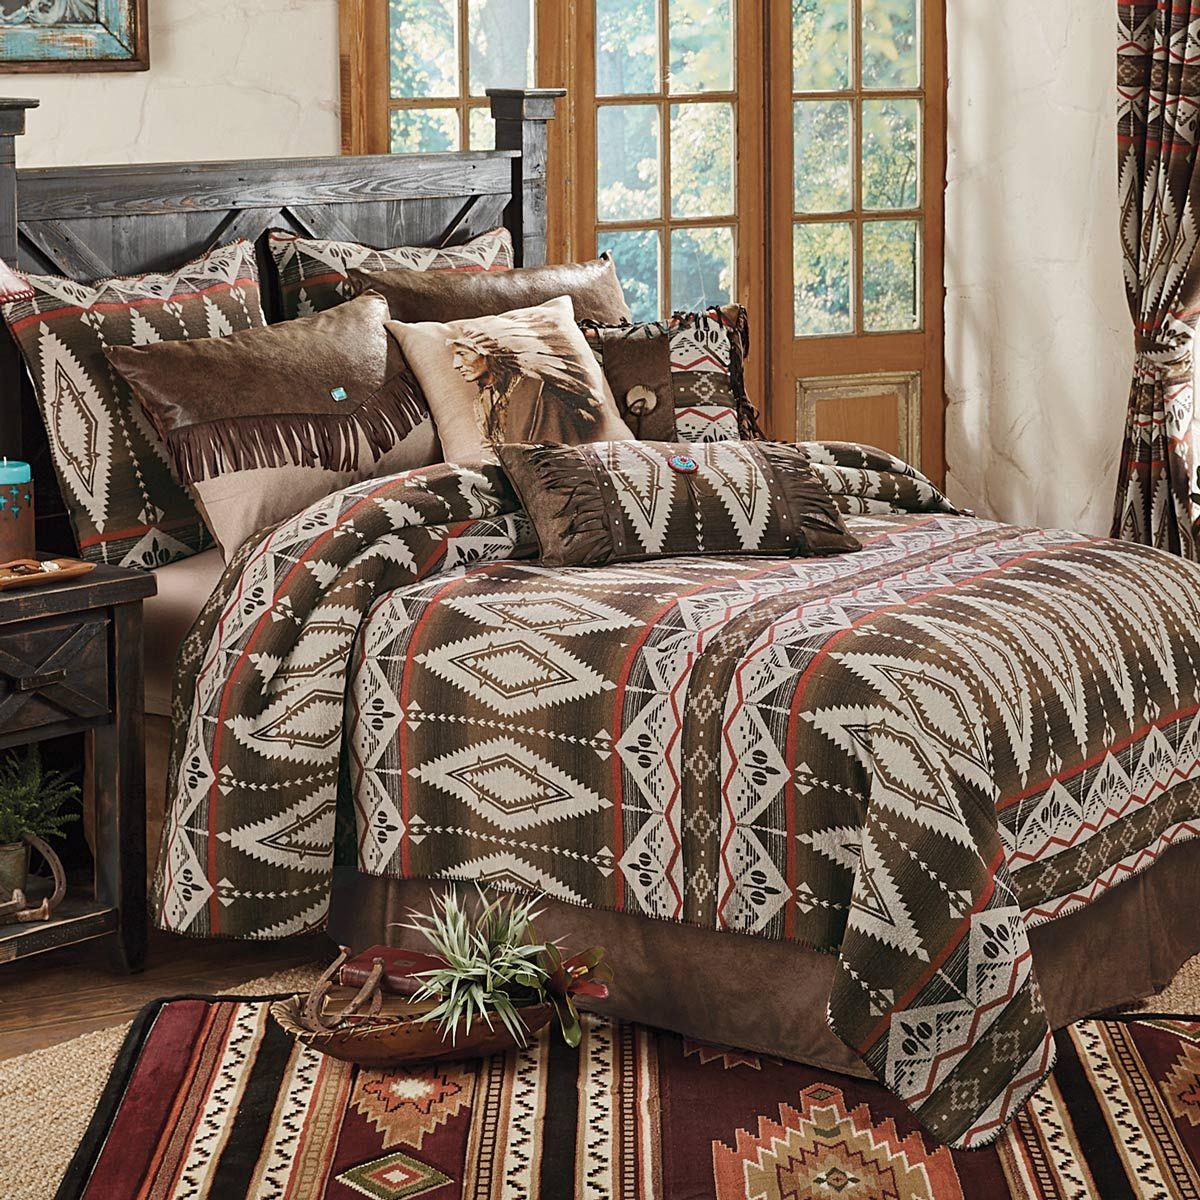 Native American Bedding Western Bedding Southwestern Bedding Bedding Sets